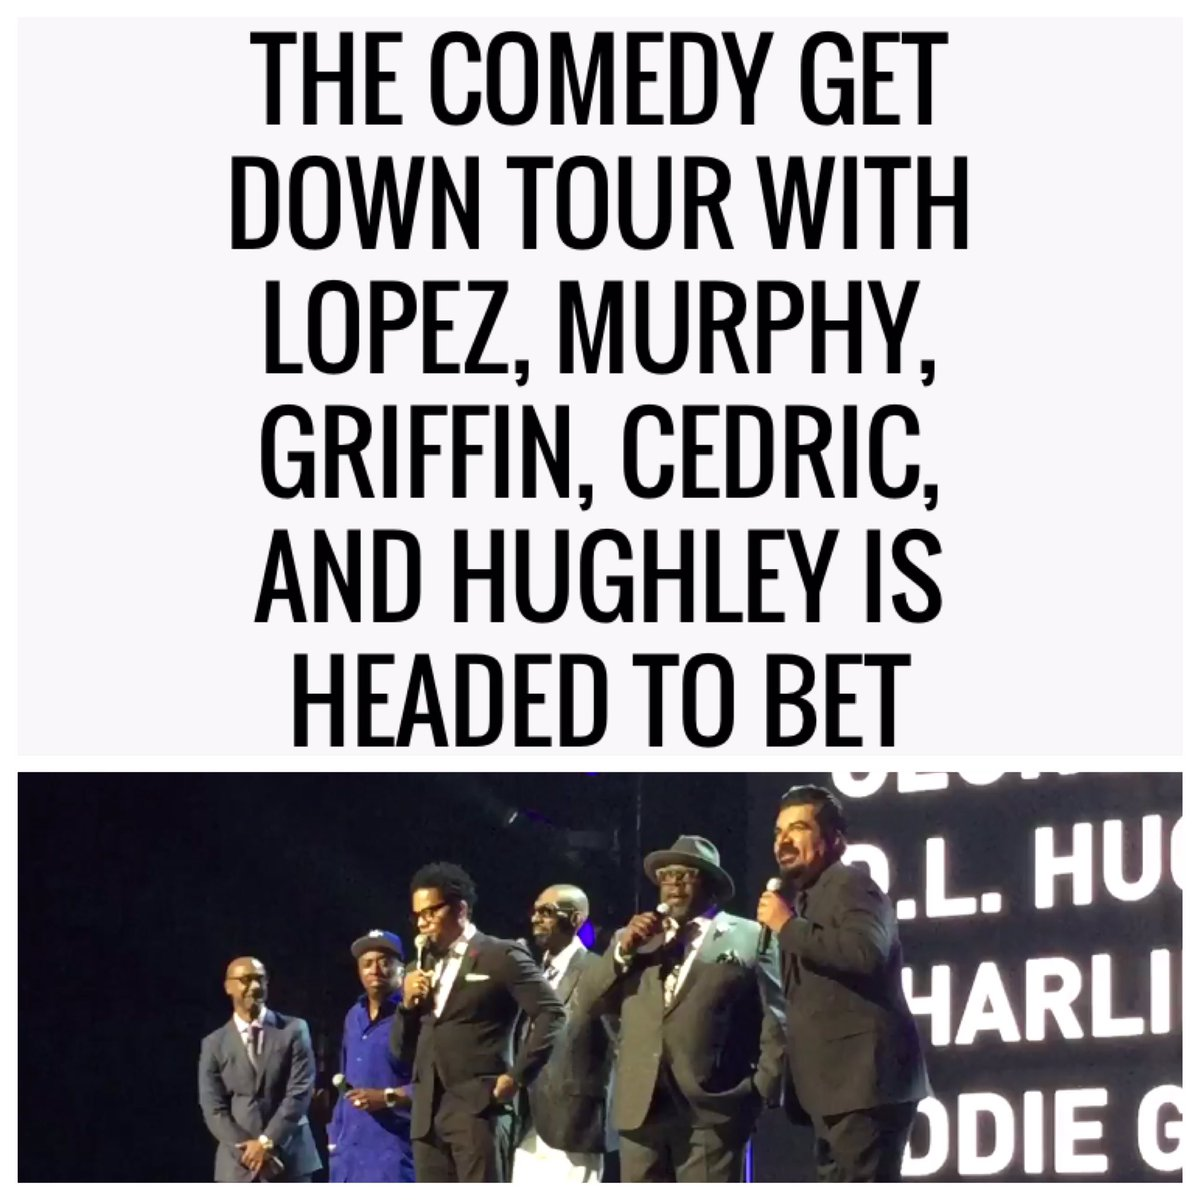 Congrats @ComedyGetDown Fam!!! xoxo ❤️ @RealDLHughley @georgelopez @CedEntertainer @EddieGriffinCom @charliemurphy https://t.co/nmfVDF3Tzd